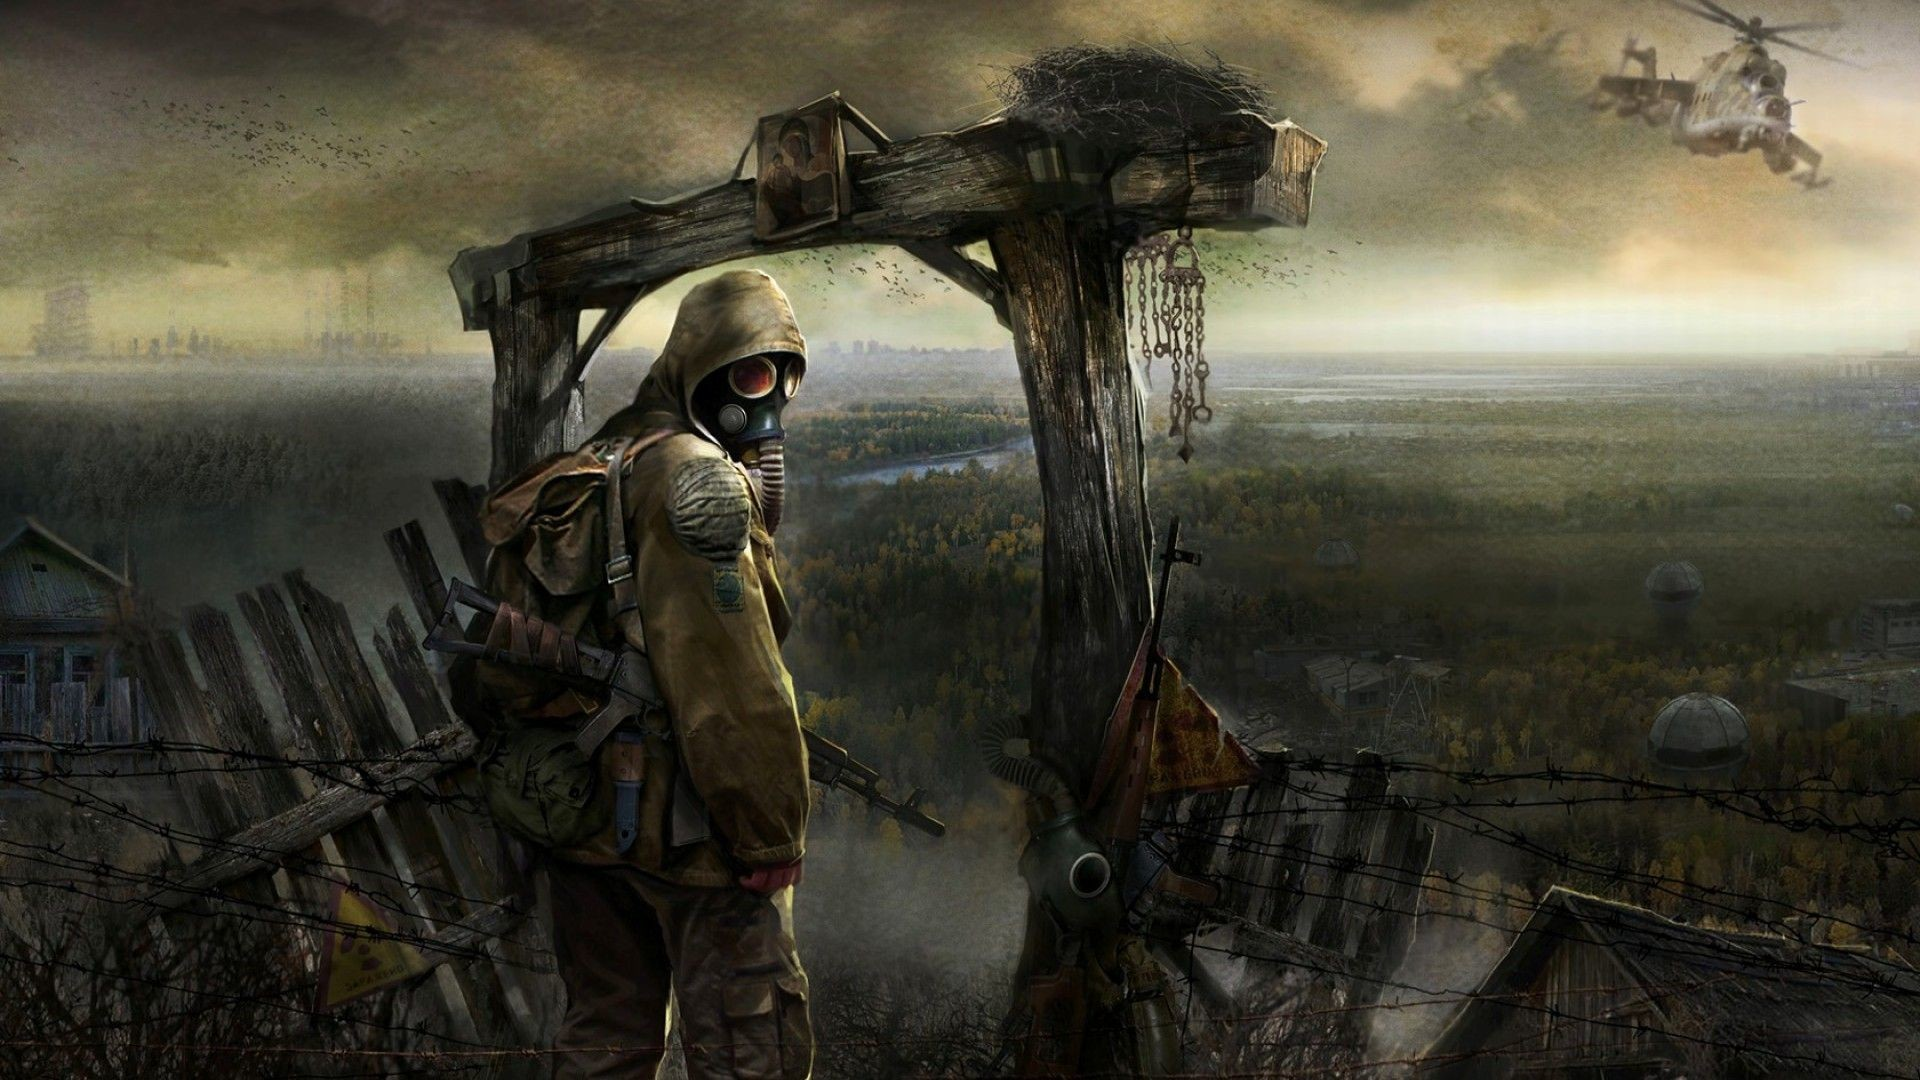 Fallout New Vegas Wallpapers – ShareMotive.com